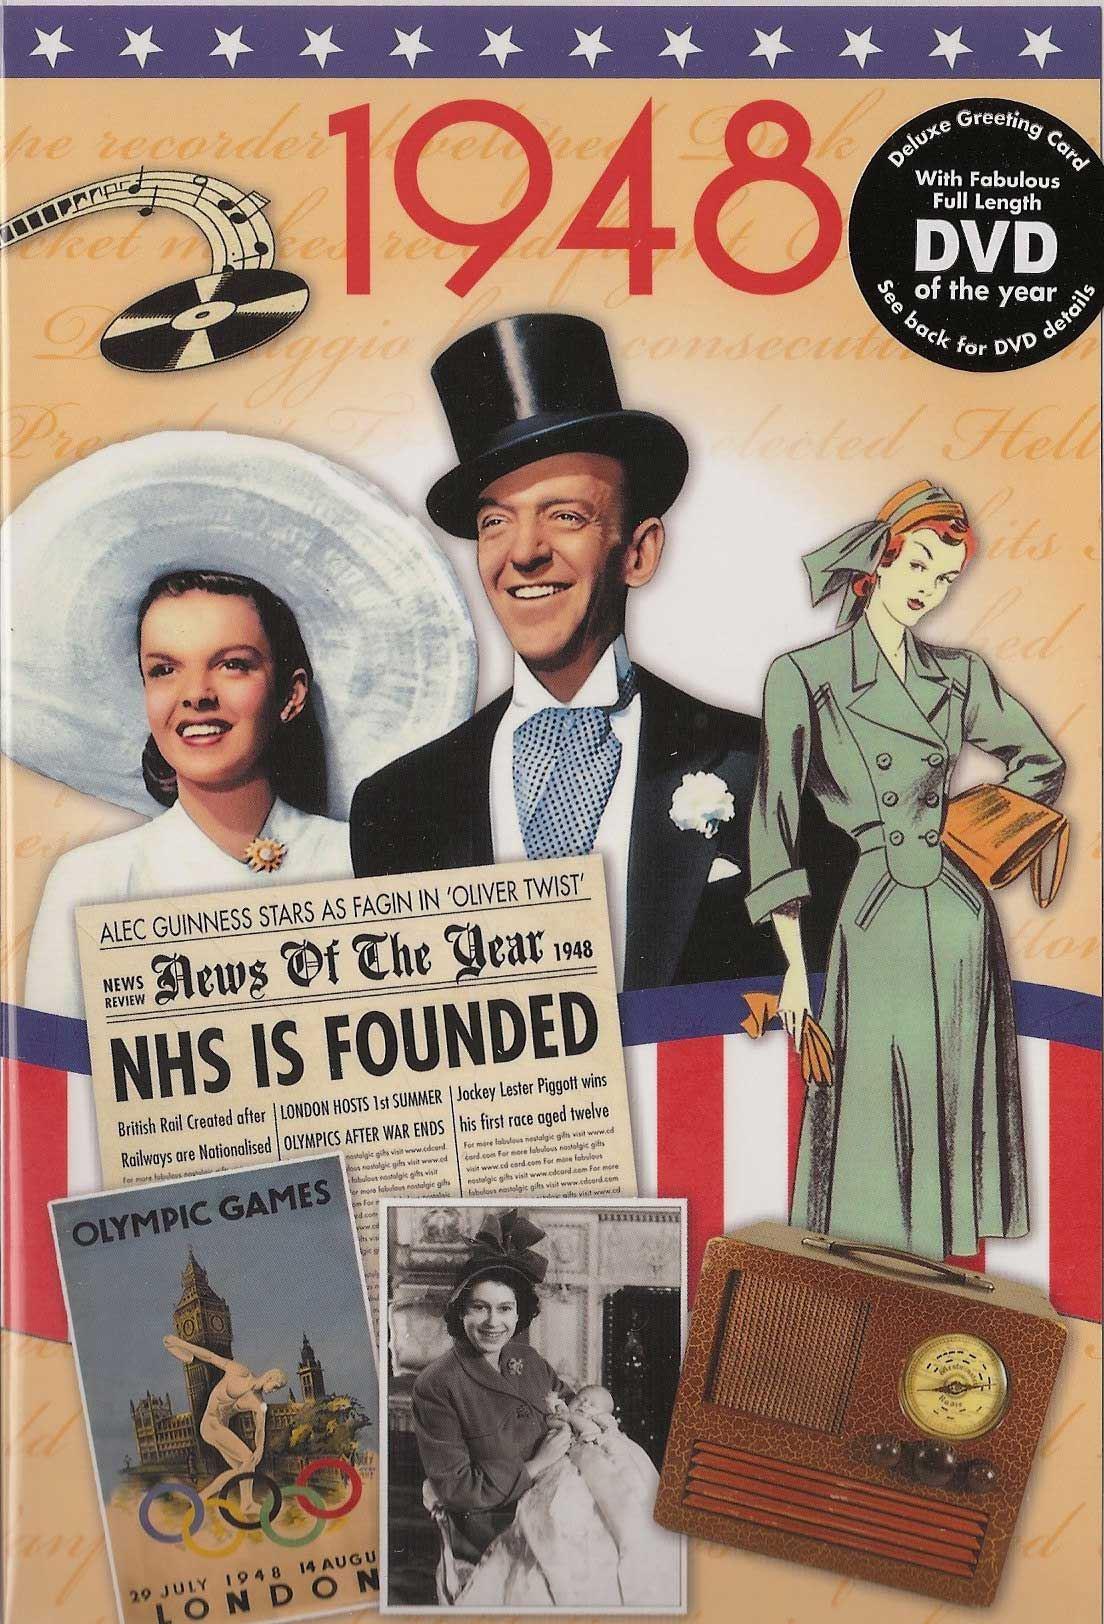 70th Platinum Wedding Anniversary Gift Reminisce 1948 With Dvd